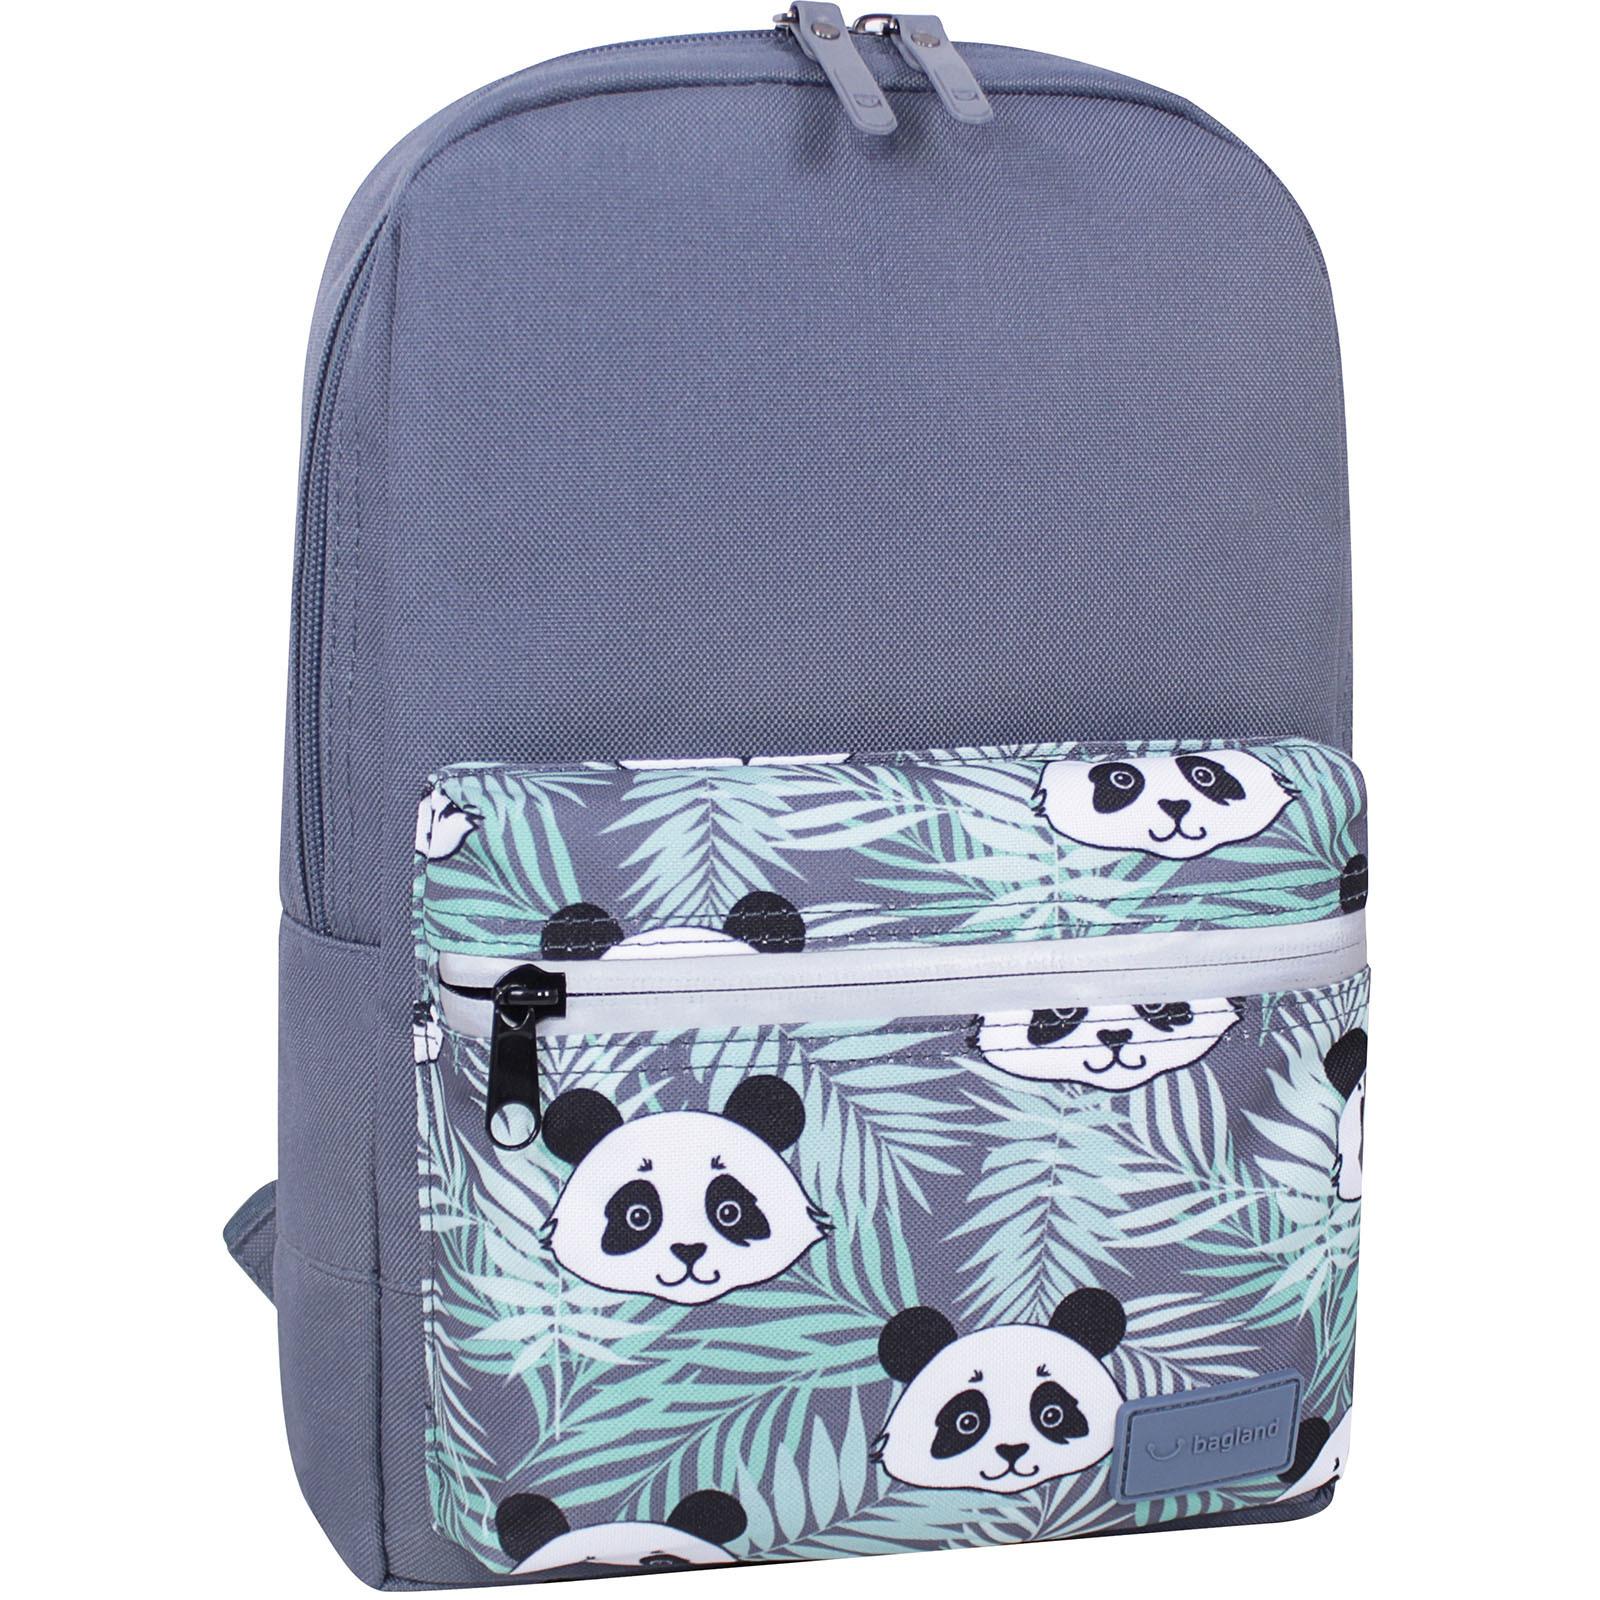 Молодежные рюкзаки Рюкзак Bagland Молодежный mini 8 л. серый 764 (0050866) IMG_1313суб.764.jpg